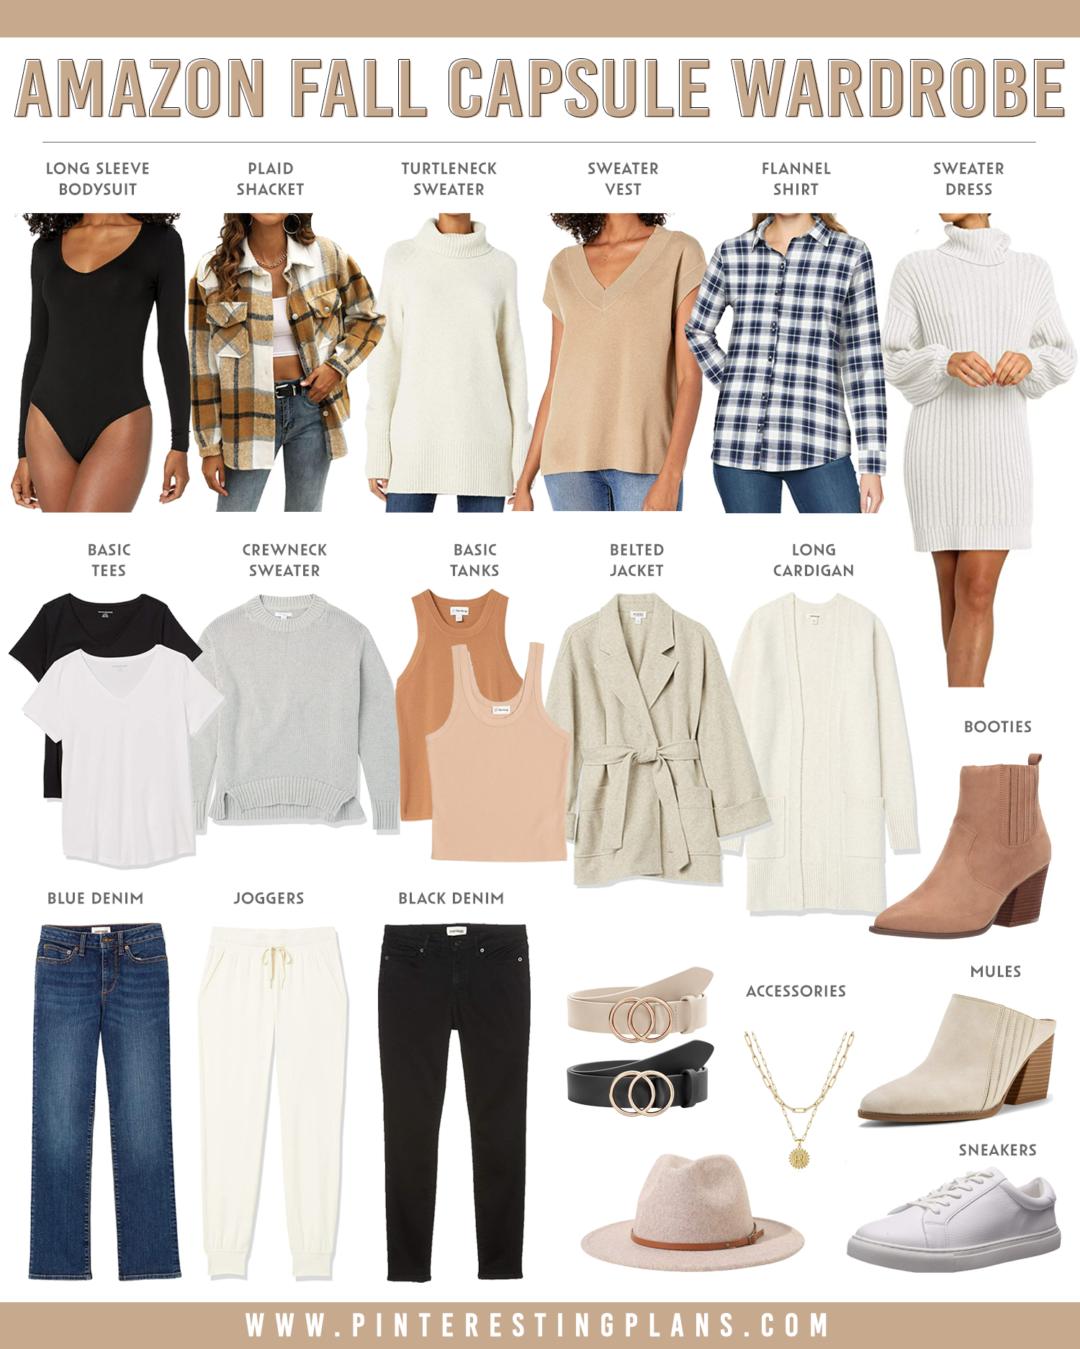 amazon fall capsule wardrobe 2021 on pinteresting plans fashion blog